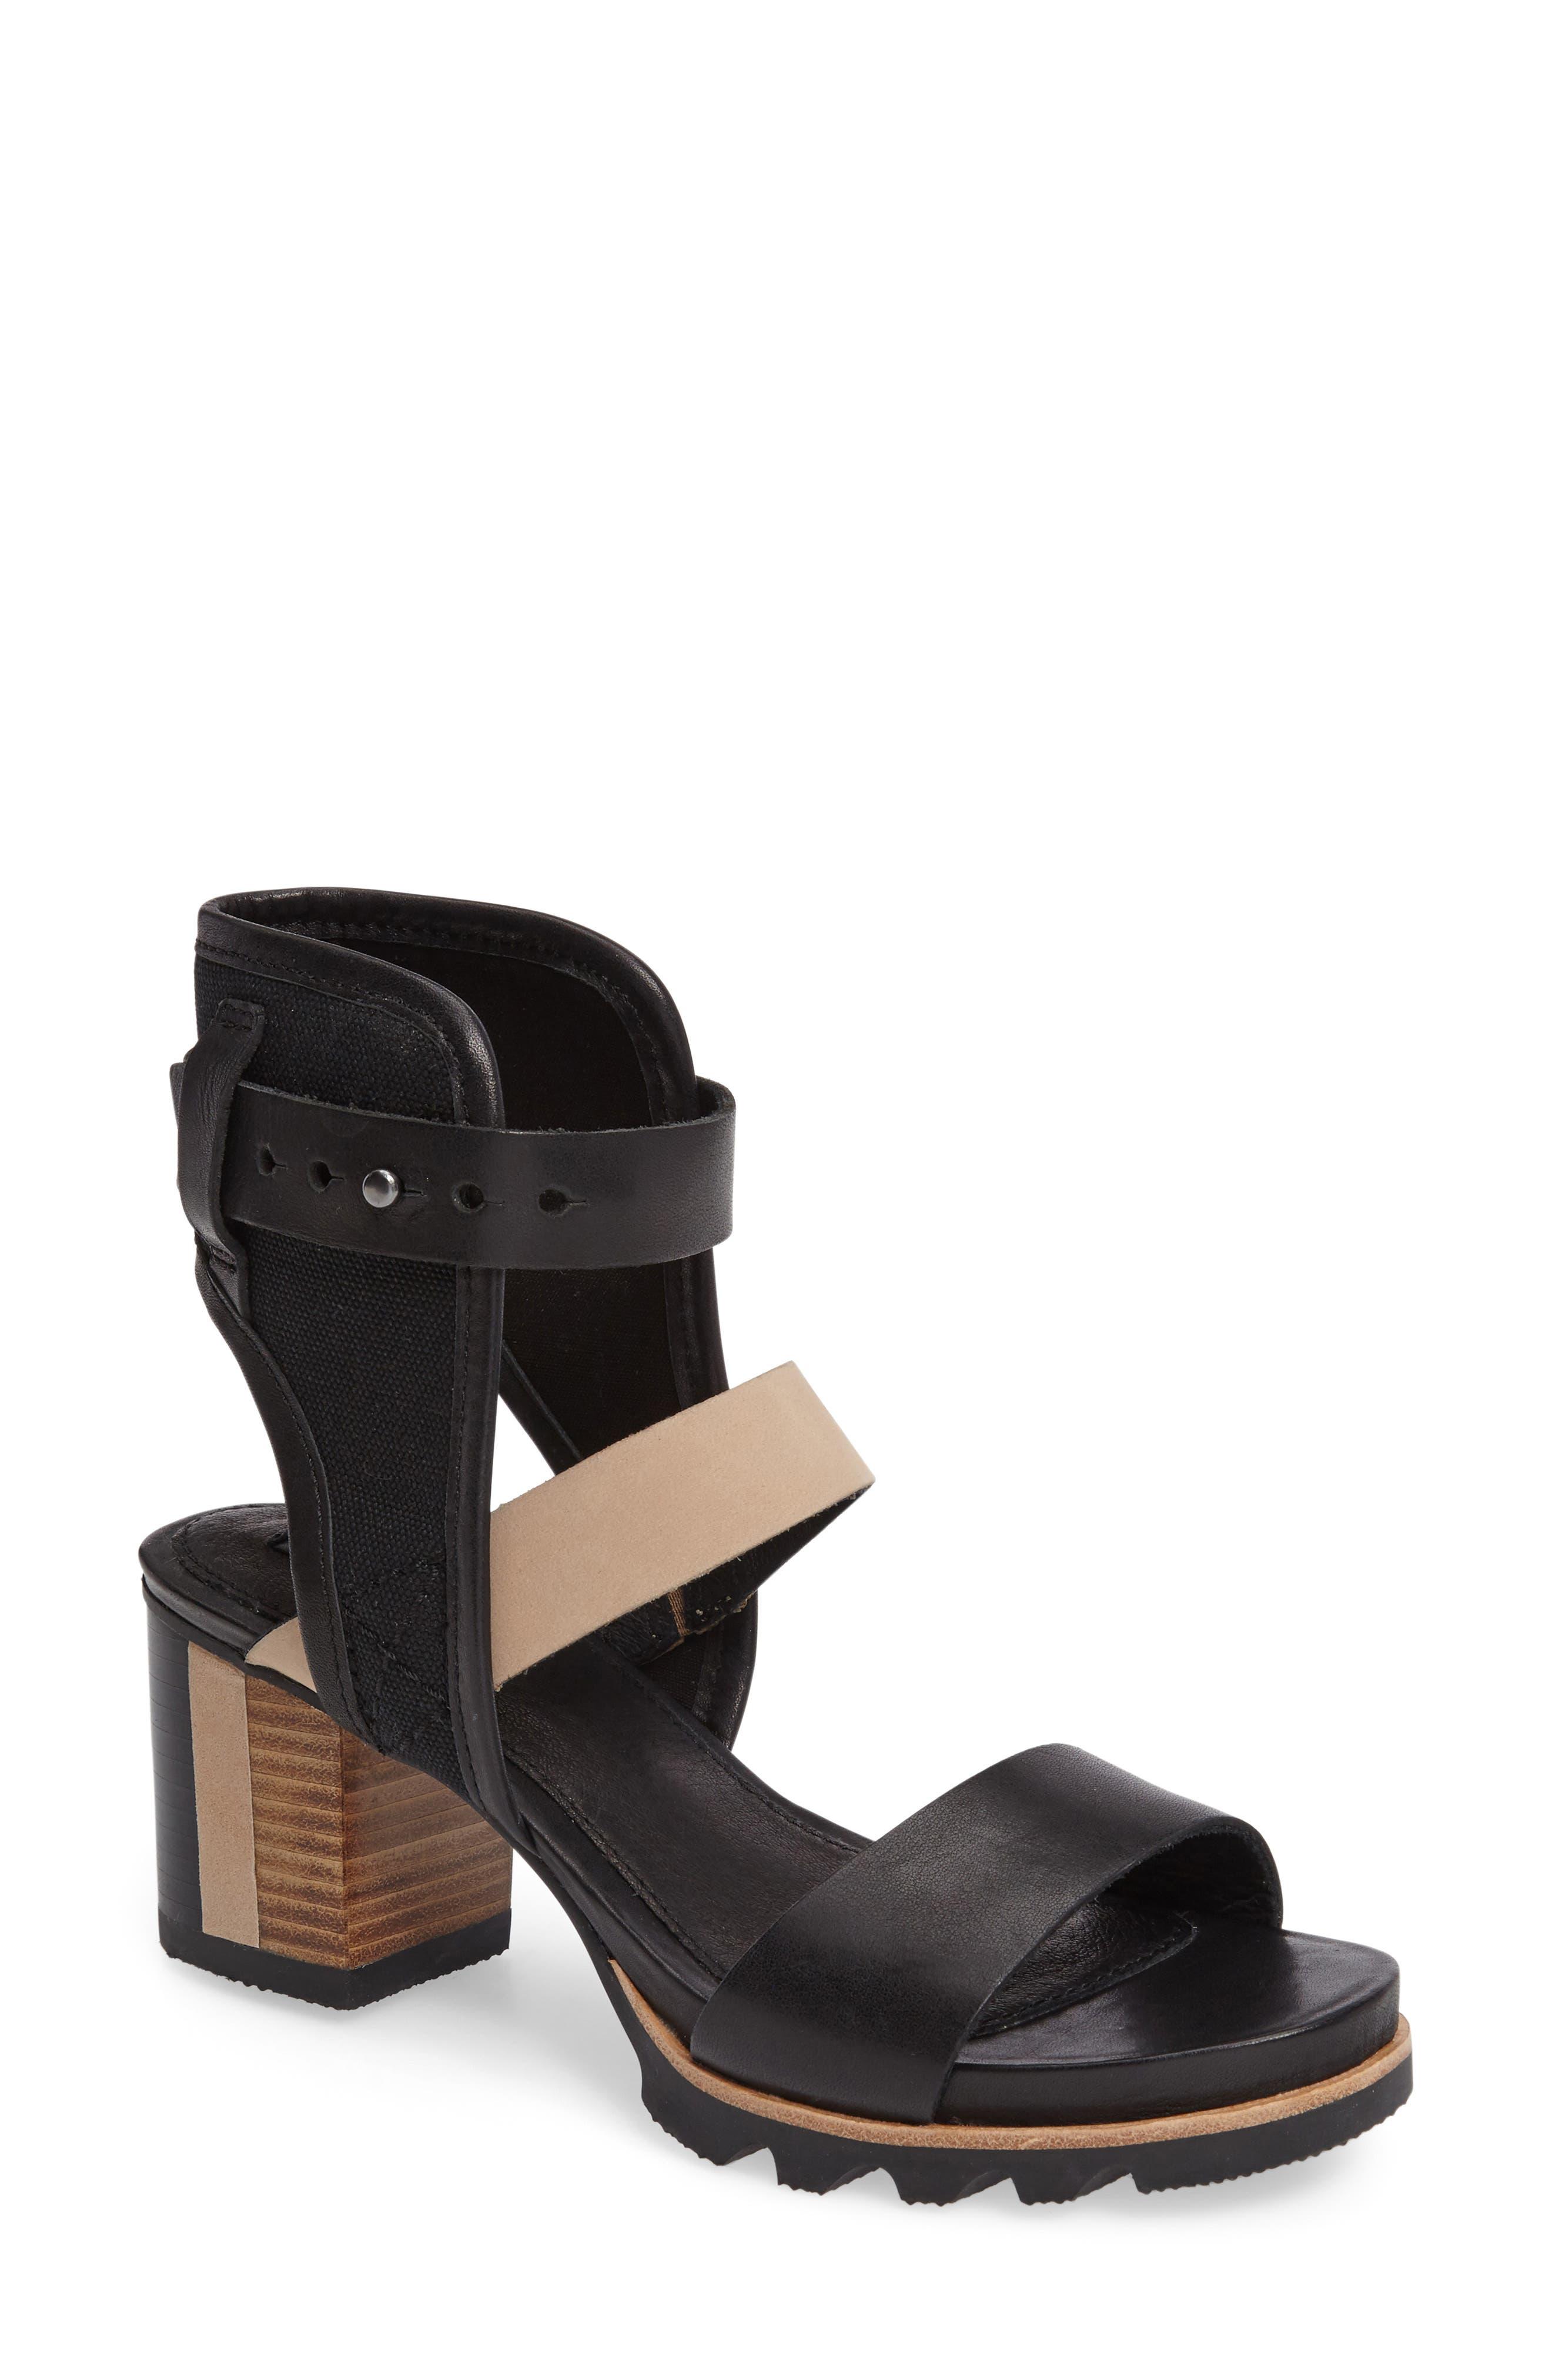 SOREL Addington Ankle Cuff Sandal (Women)